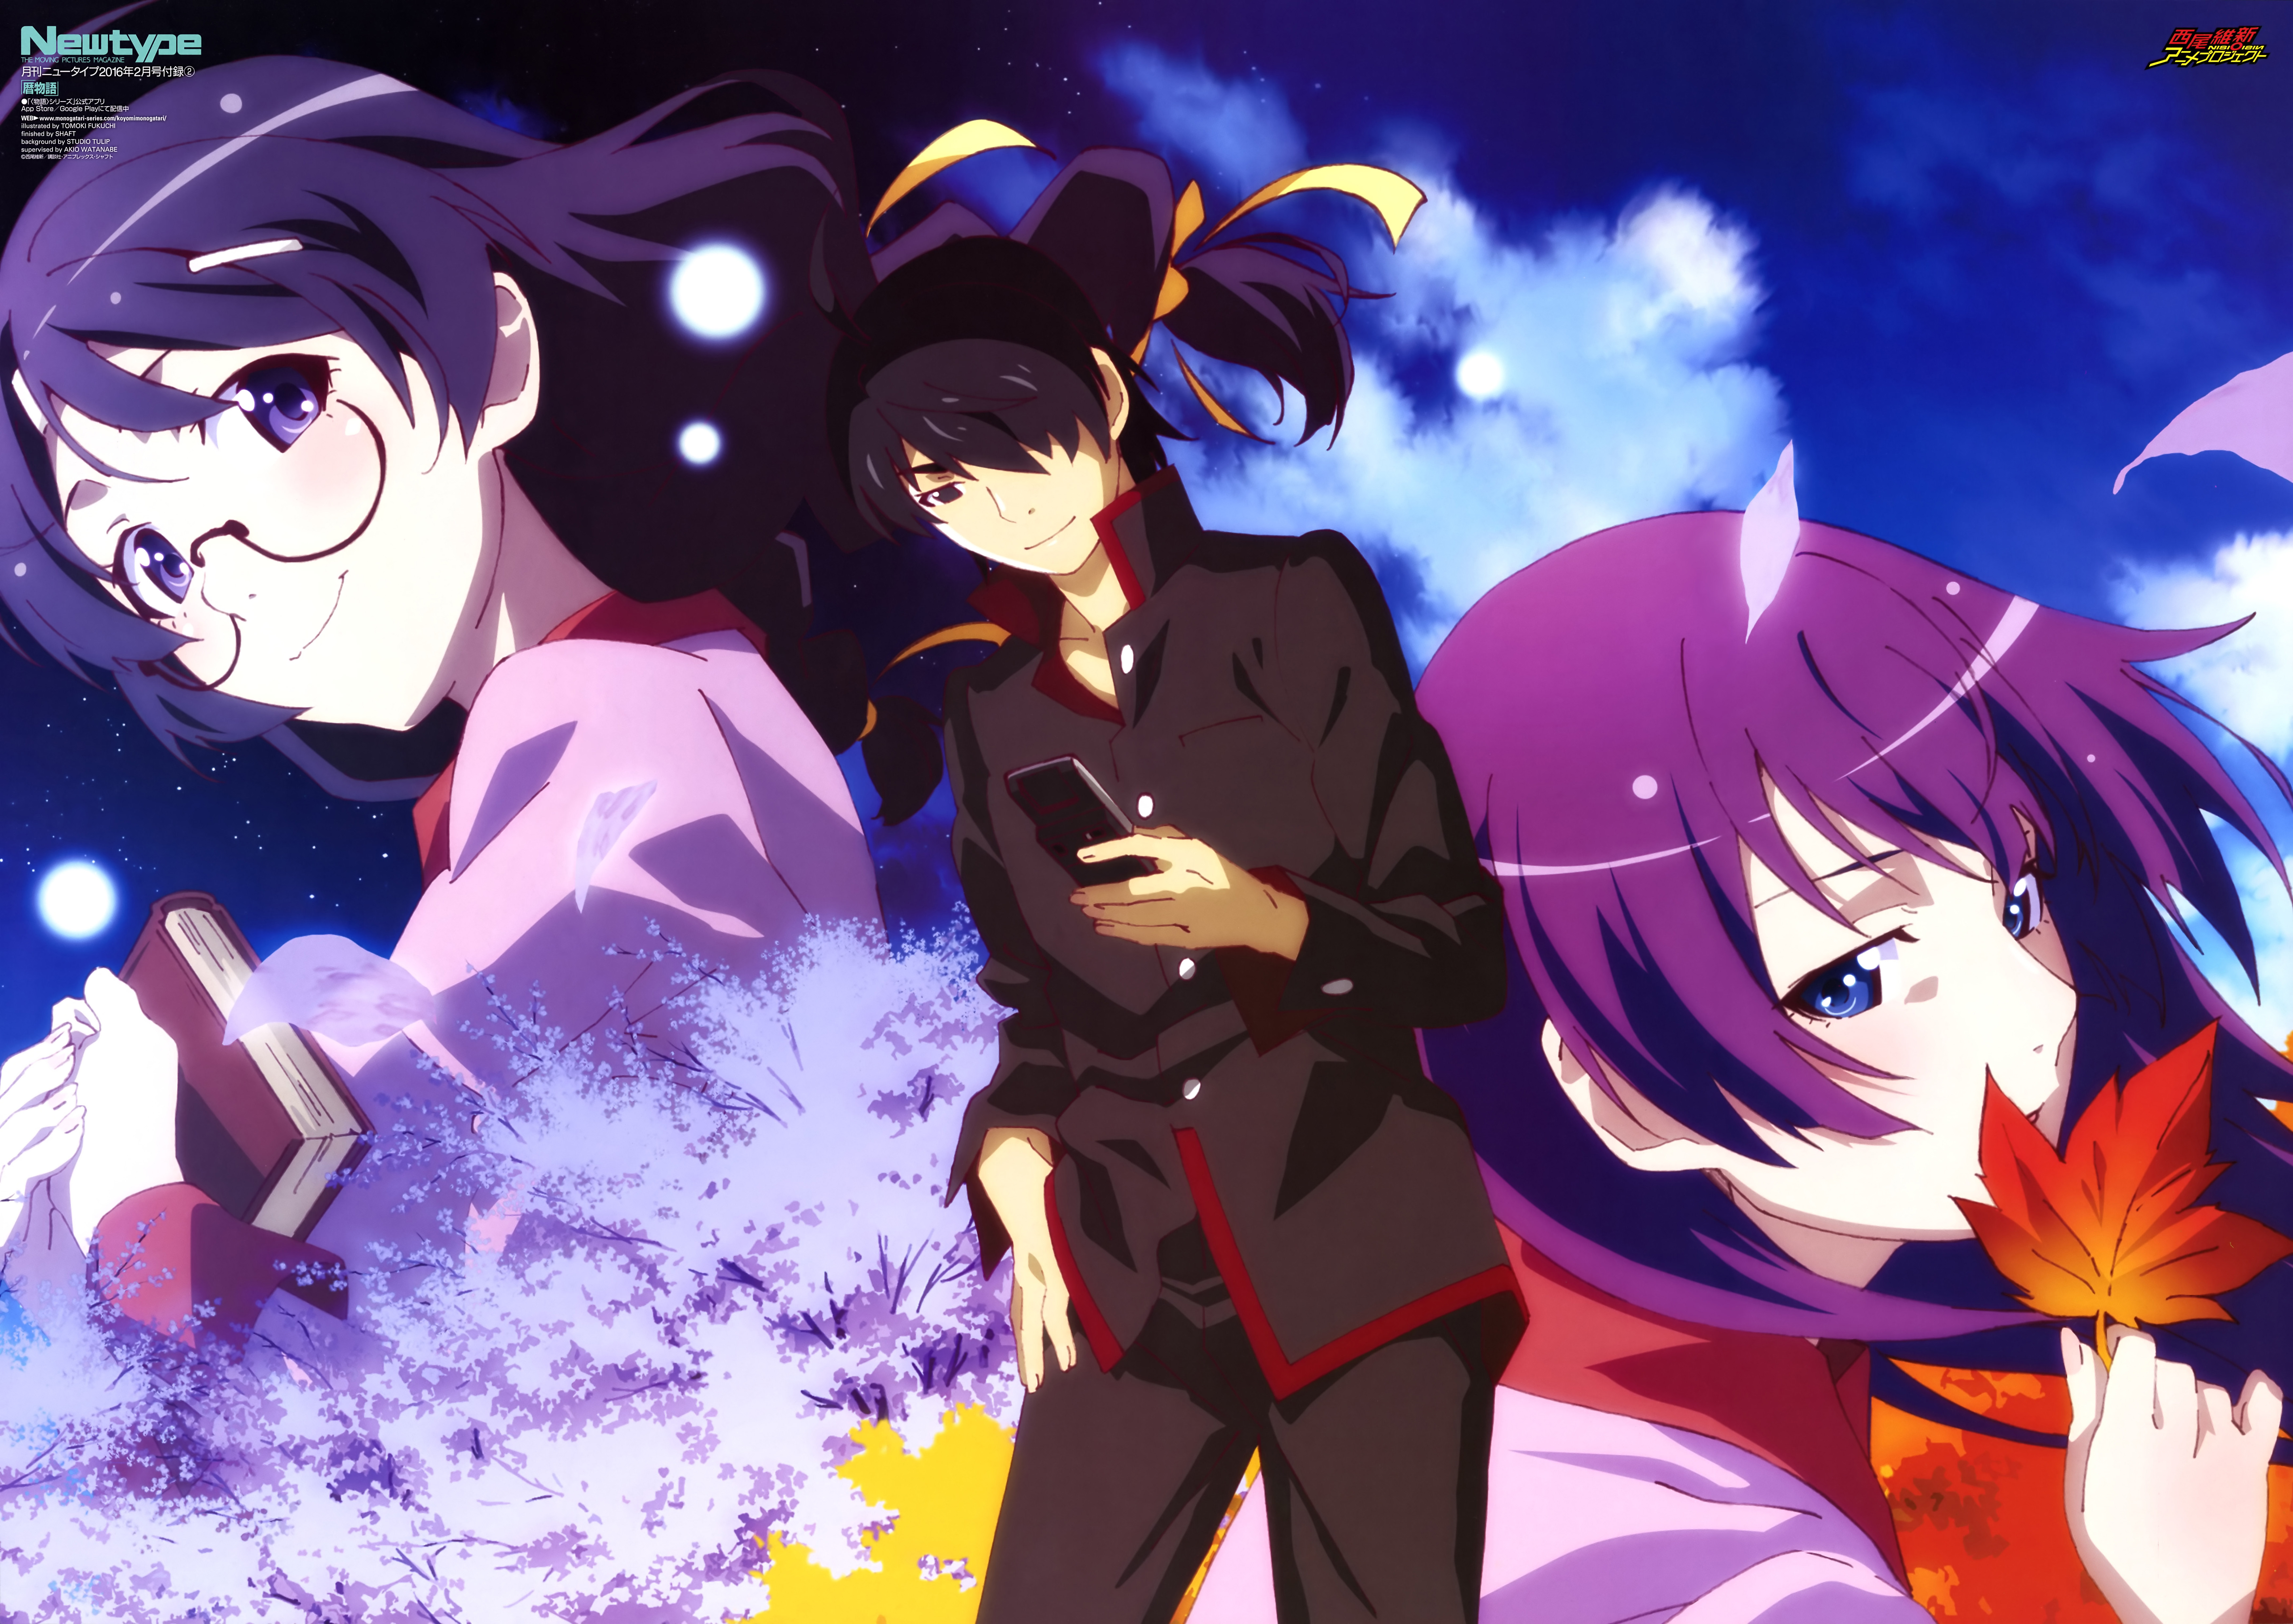 bakemonogatari anime poster featured in newtype february 2016 issue